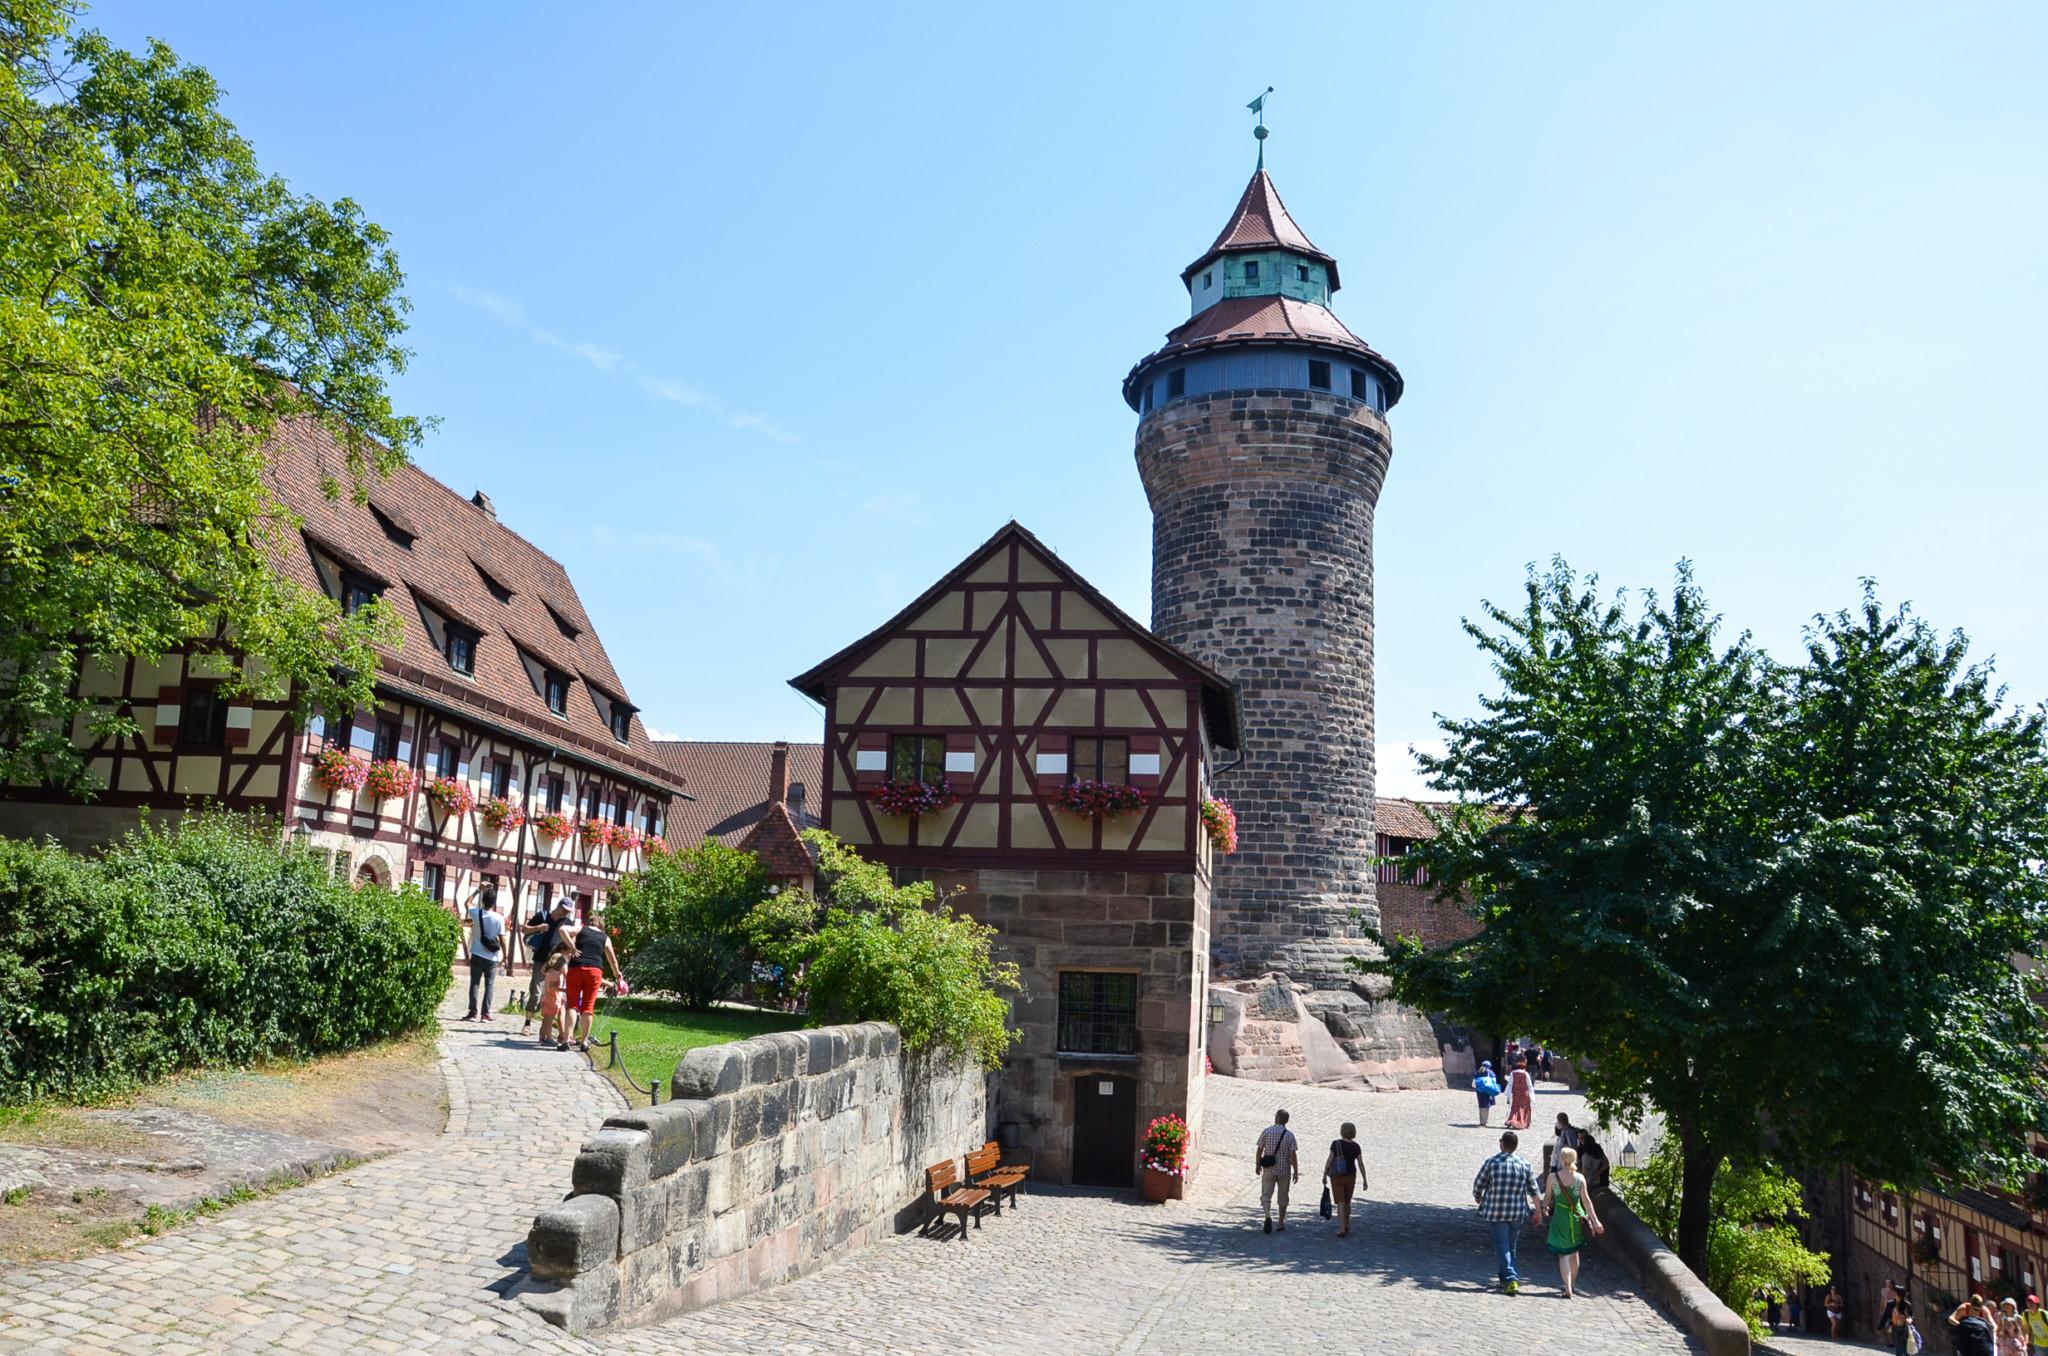 Die Kaiserburg in Nürnberg ist im Sommer besonders schön